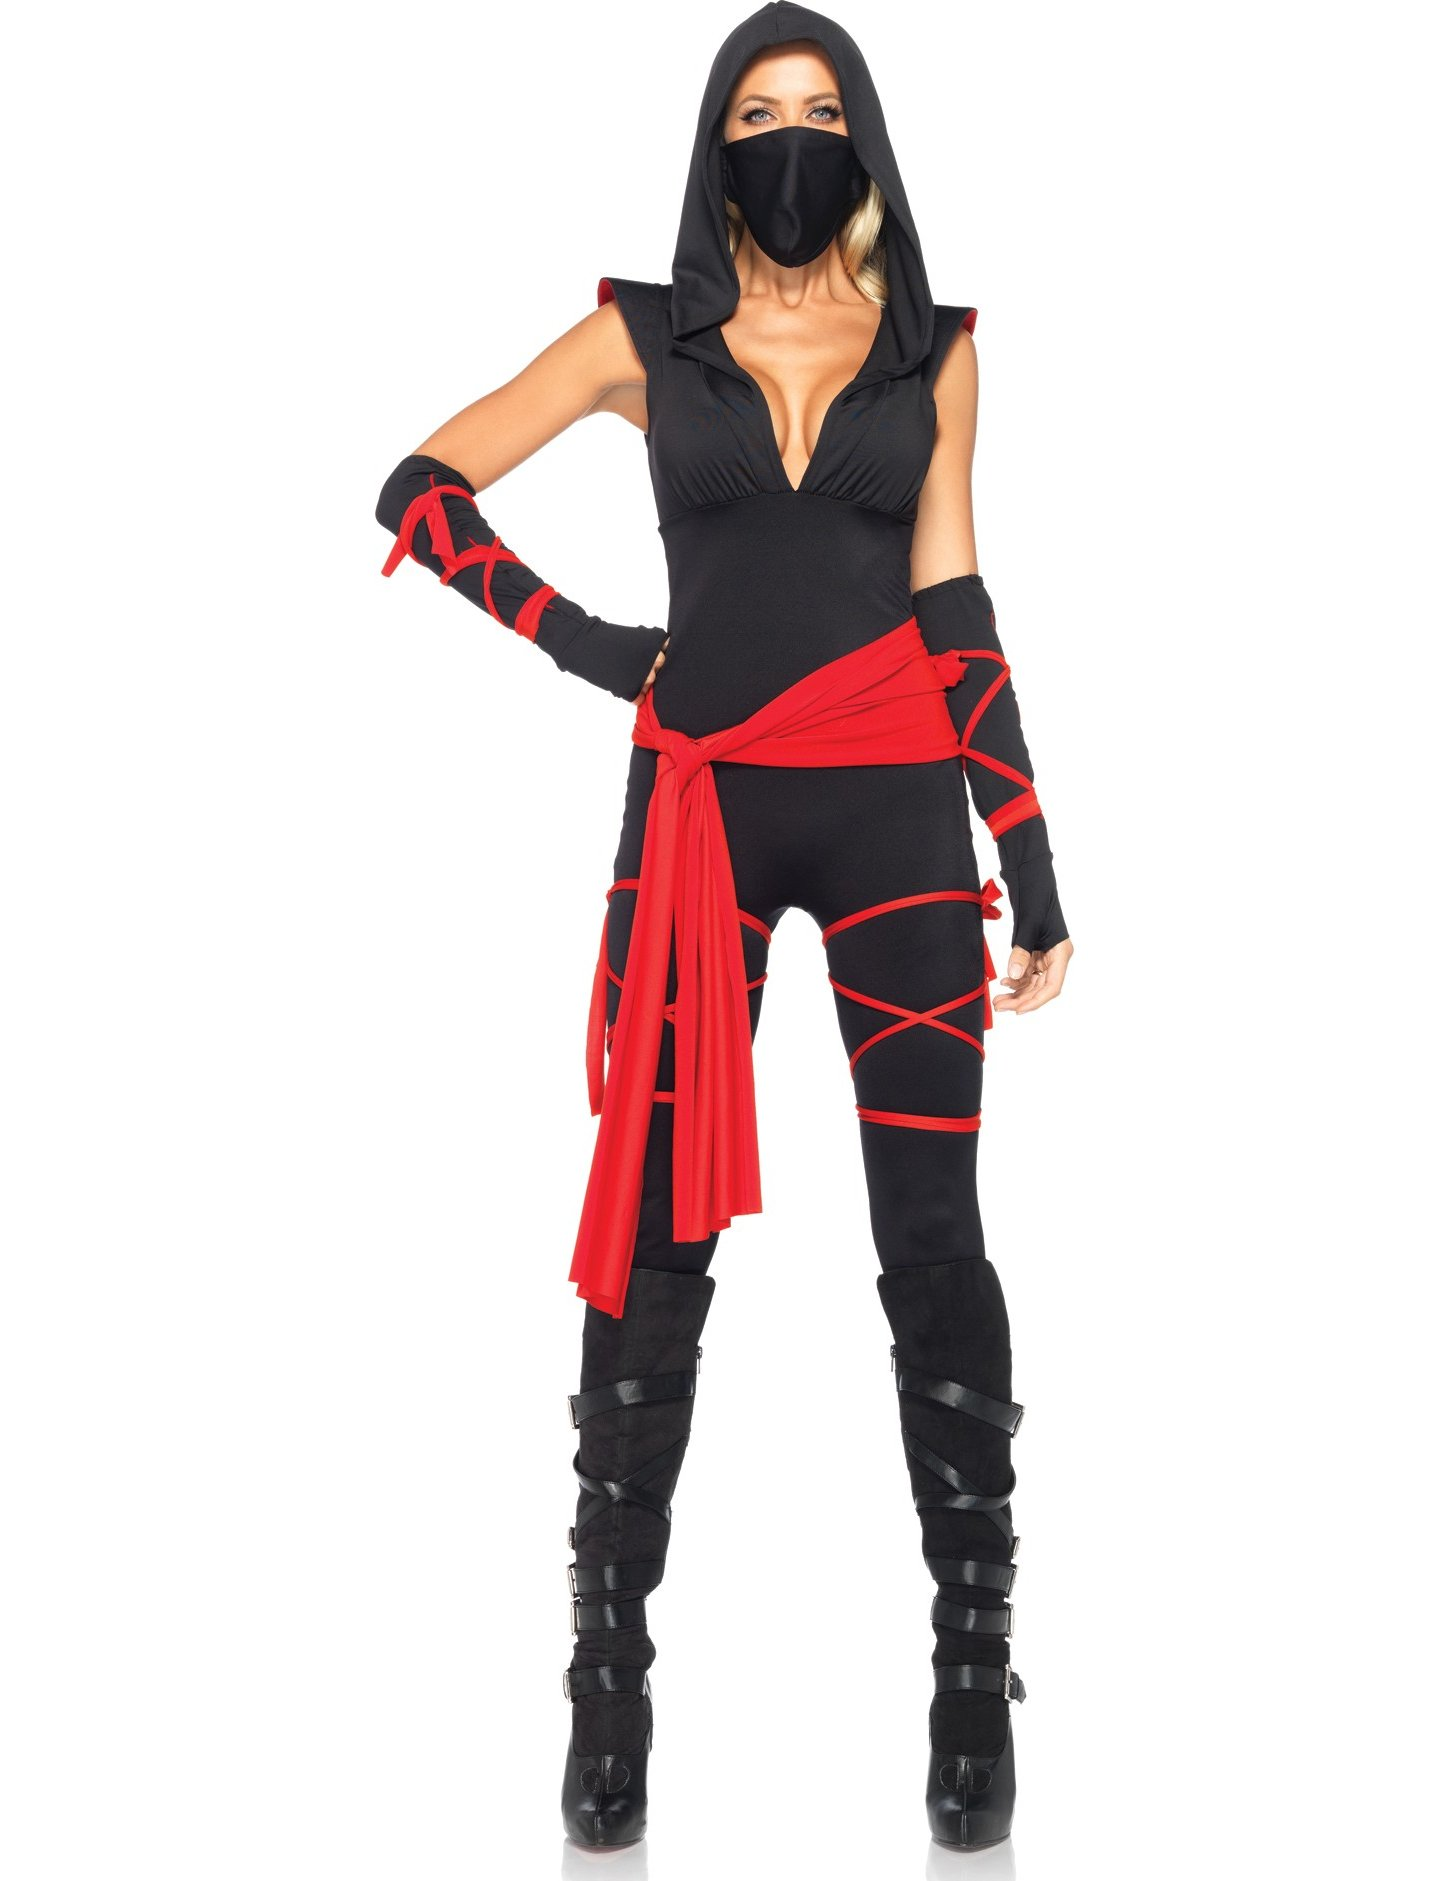 ninja kost m f r damen kost me f r erwachsene und g nstige faschingskost me vegaoo